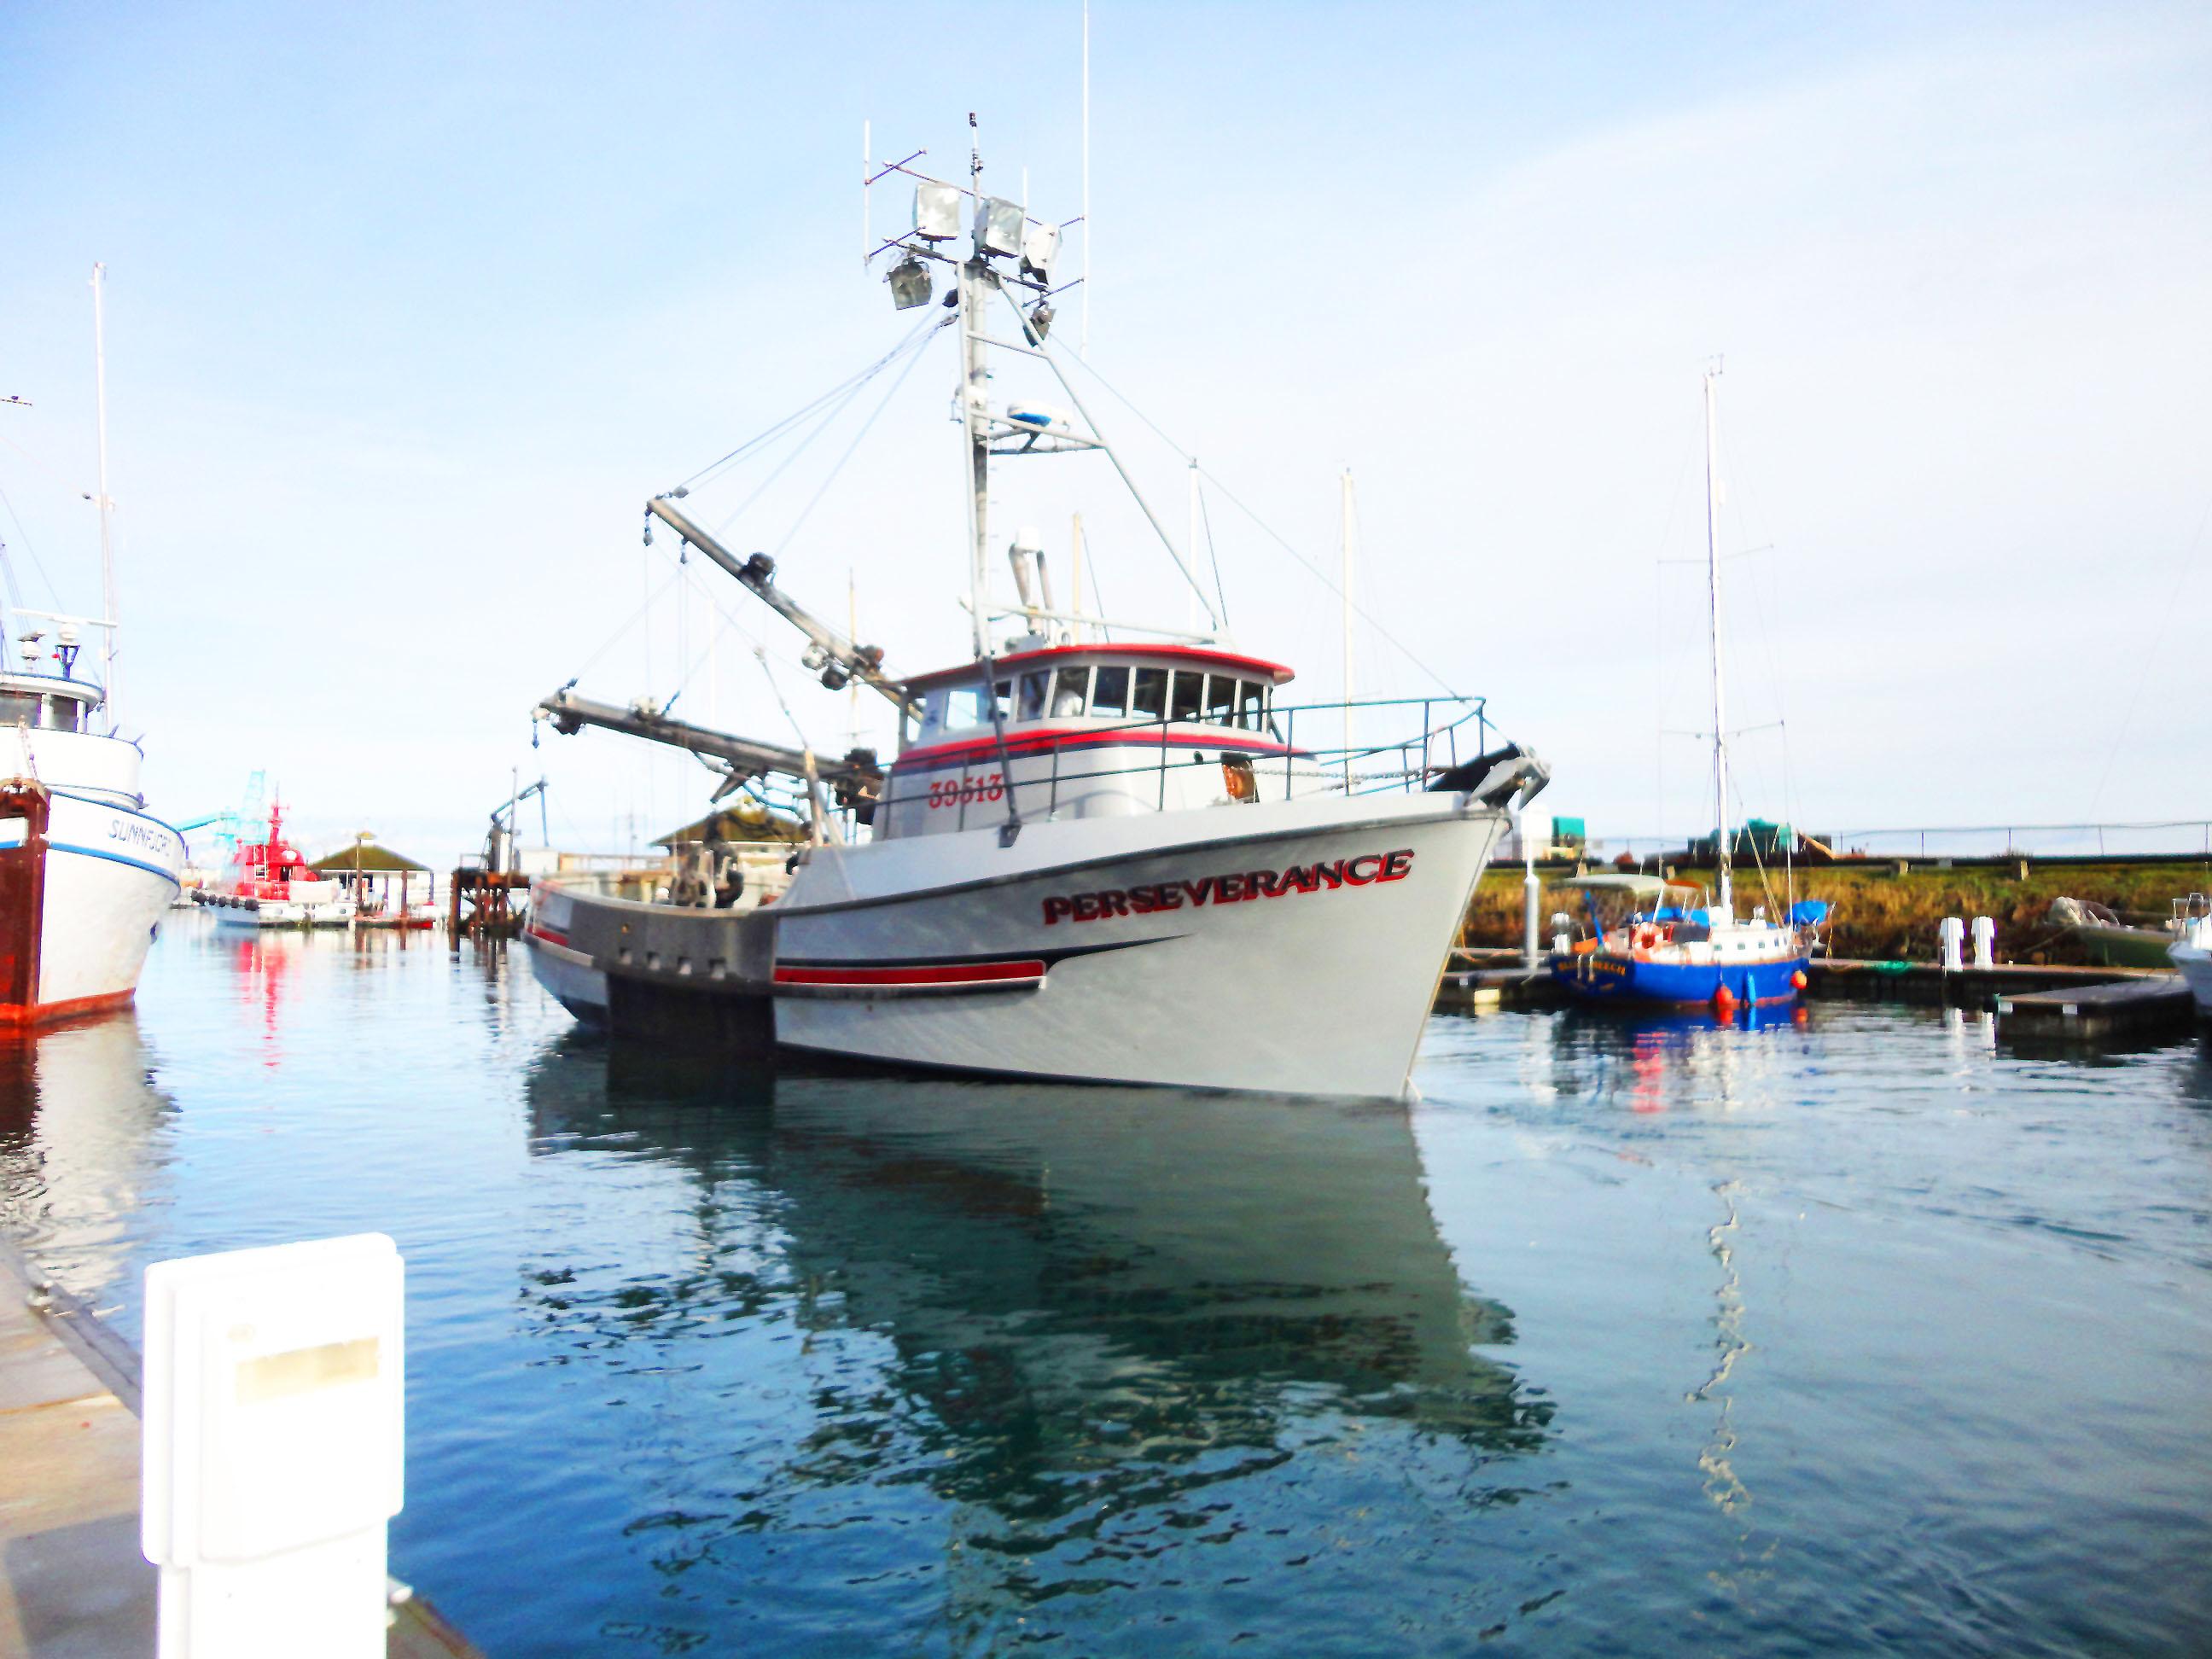 F/V Perseverance   Boating - Ships - Nautical   Pinterest   Port ...